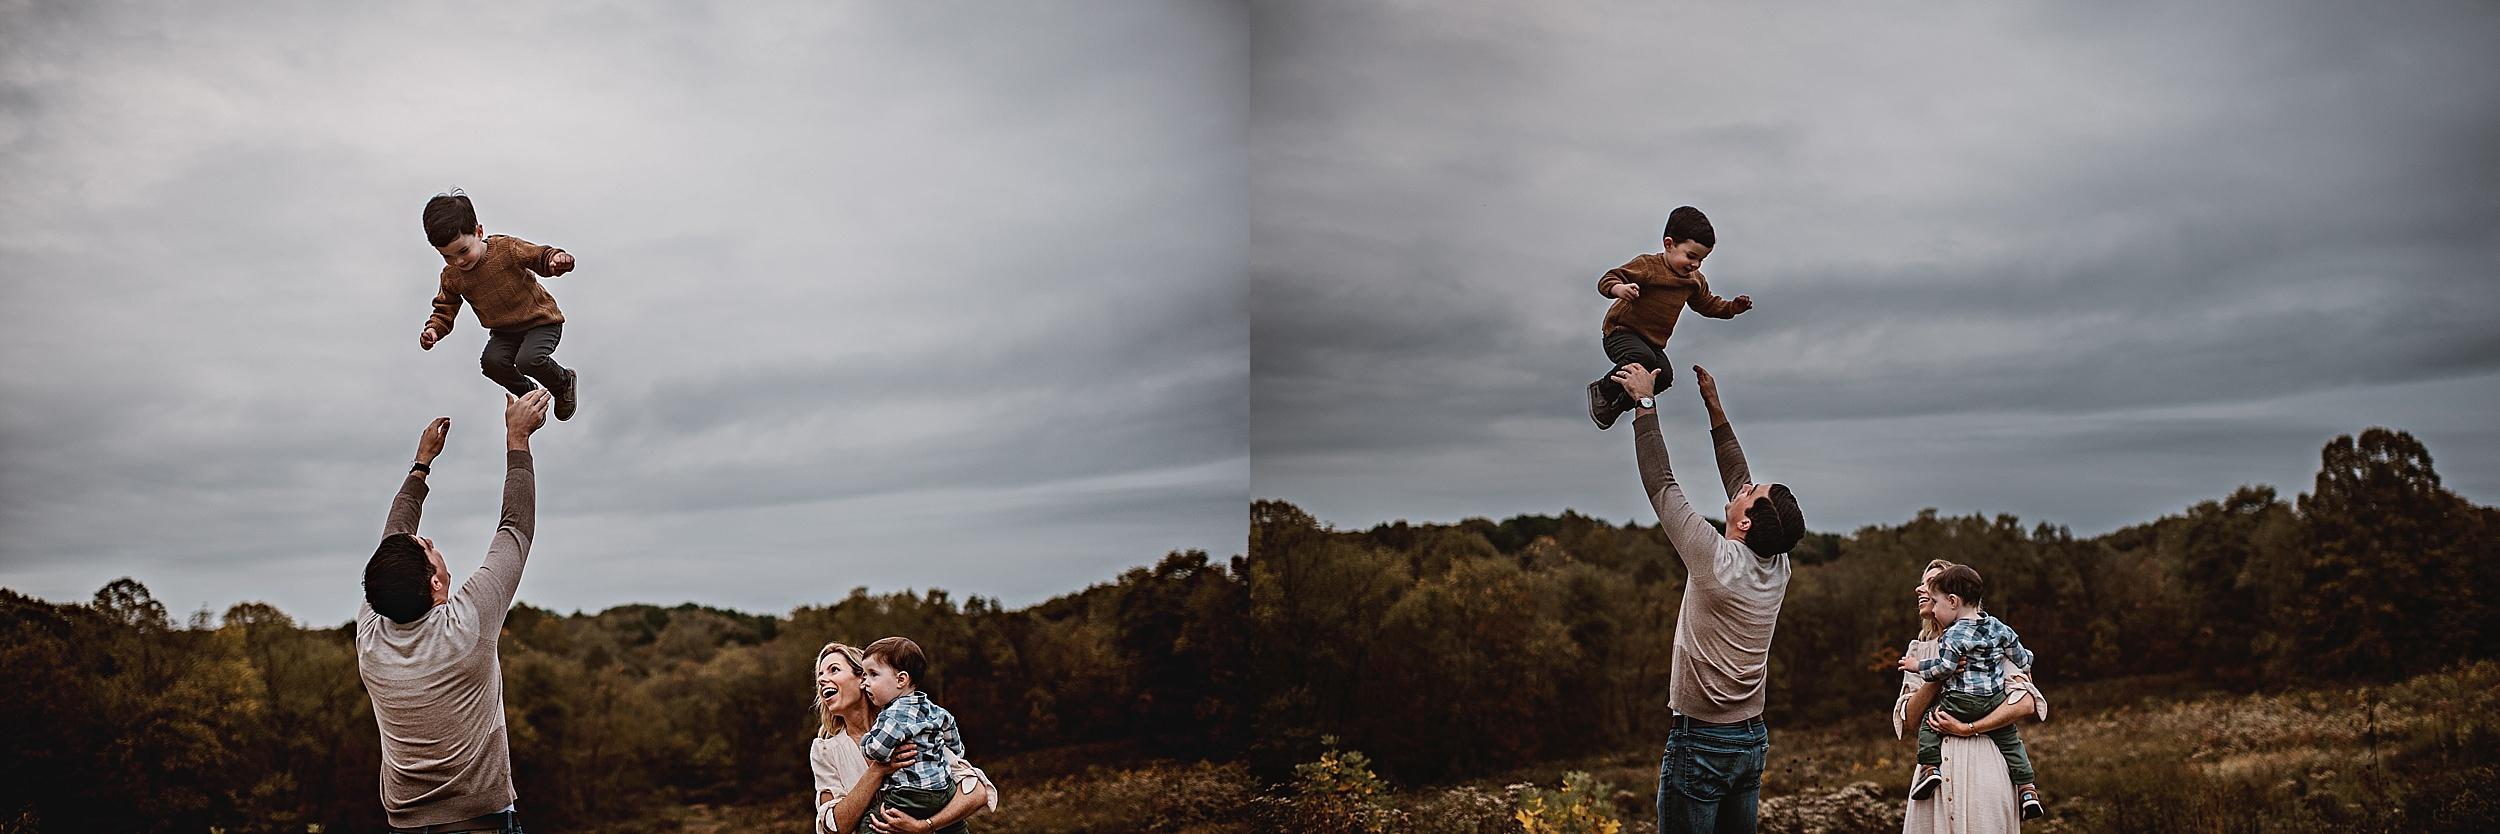 lauren-grayson-photography-portrait-artist-akron-cleveland-ohio-photographer-family-session-fields-sunset-fall_0205.jpg